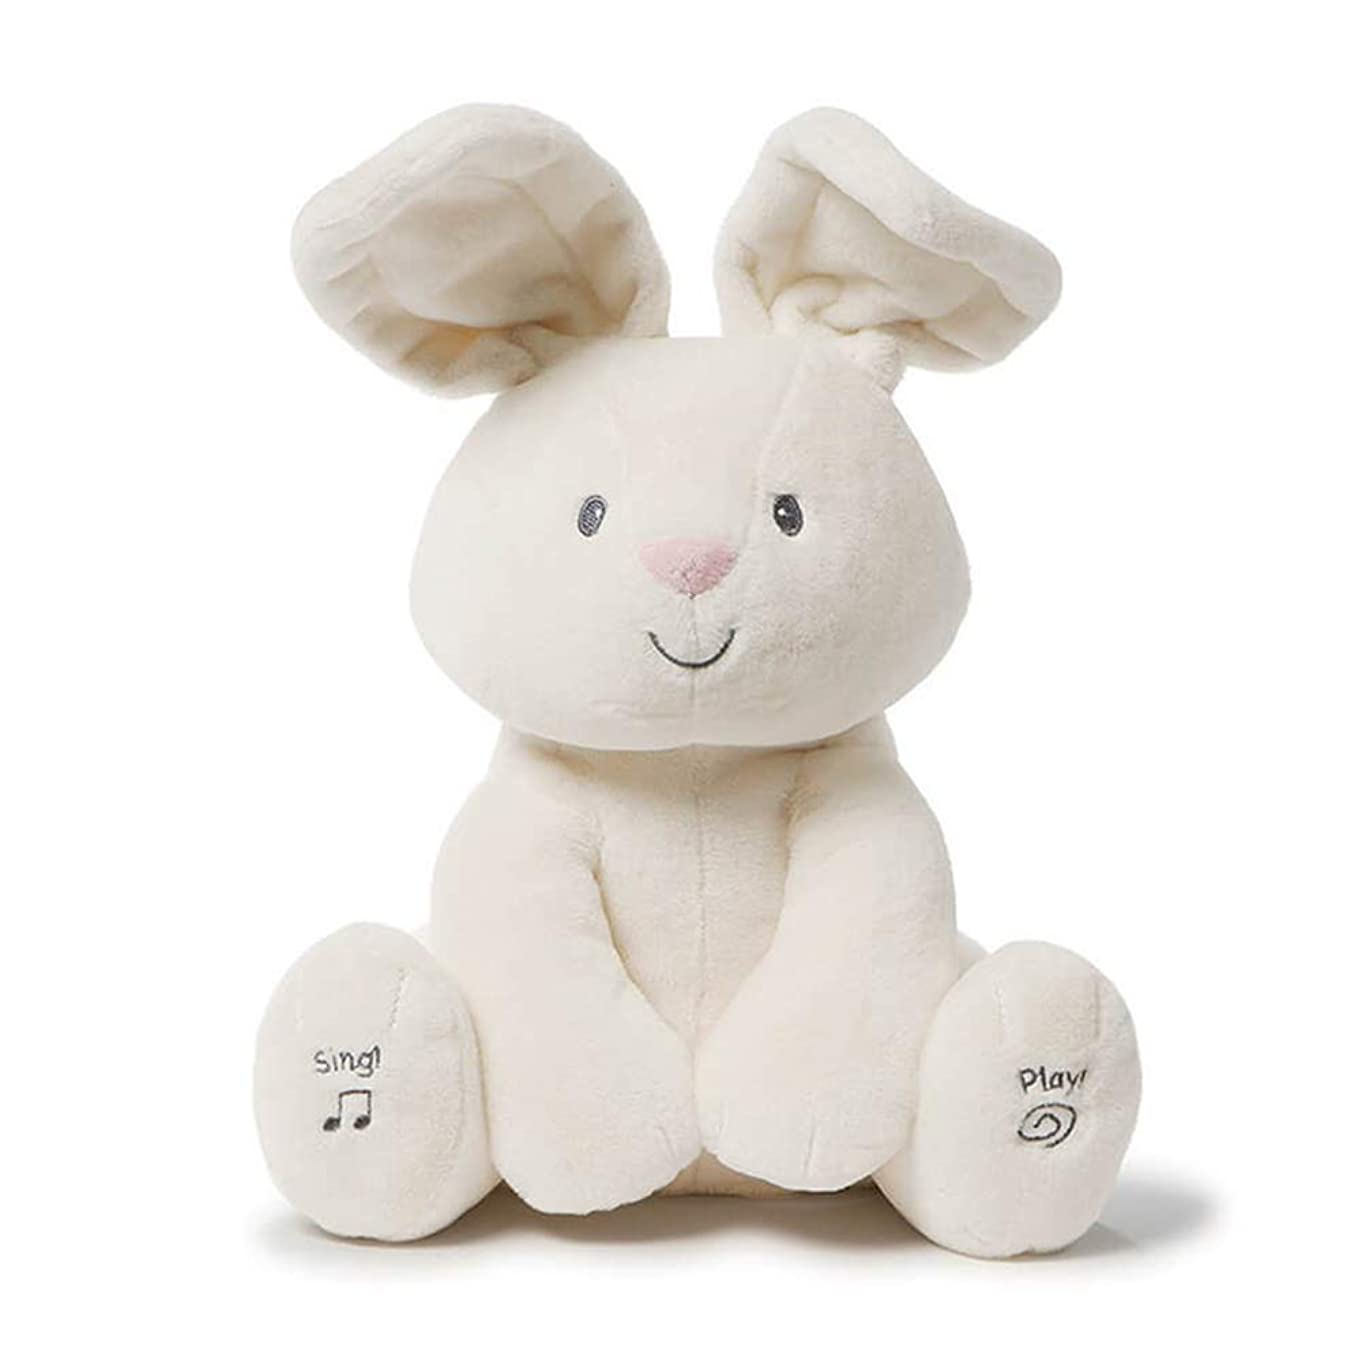 Gund Baby Flora The Bunny Animated Plush Stuffed Animal Toy, Cream, 12